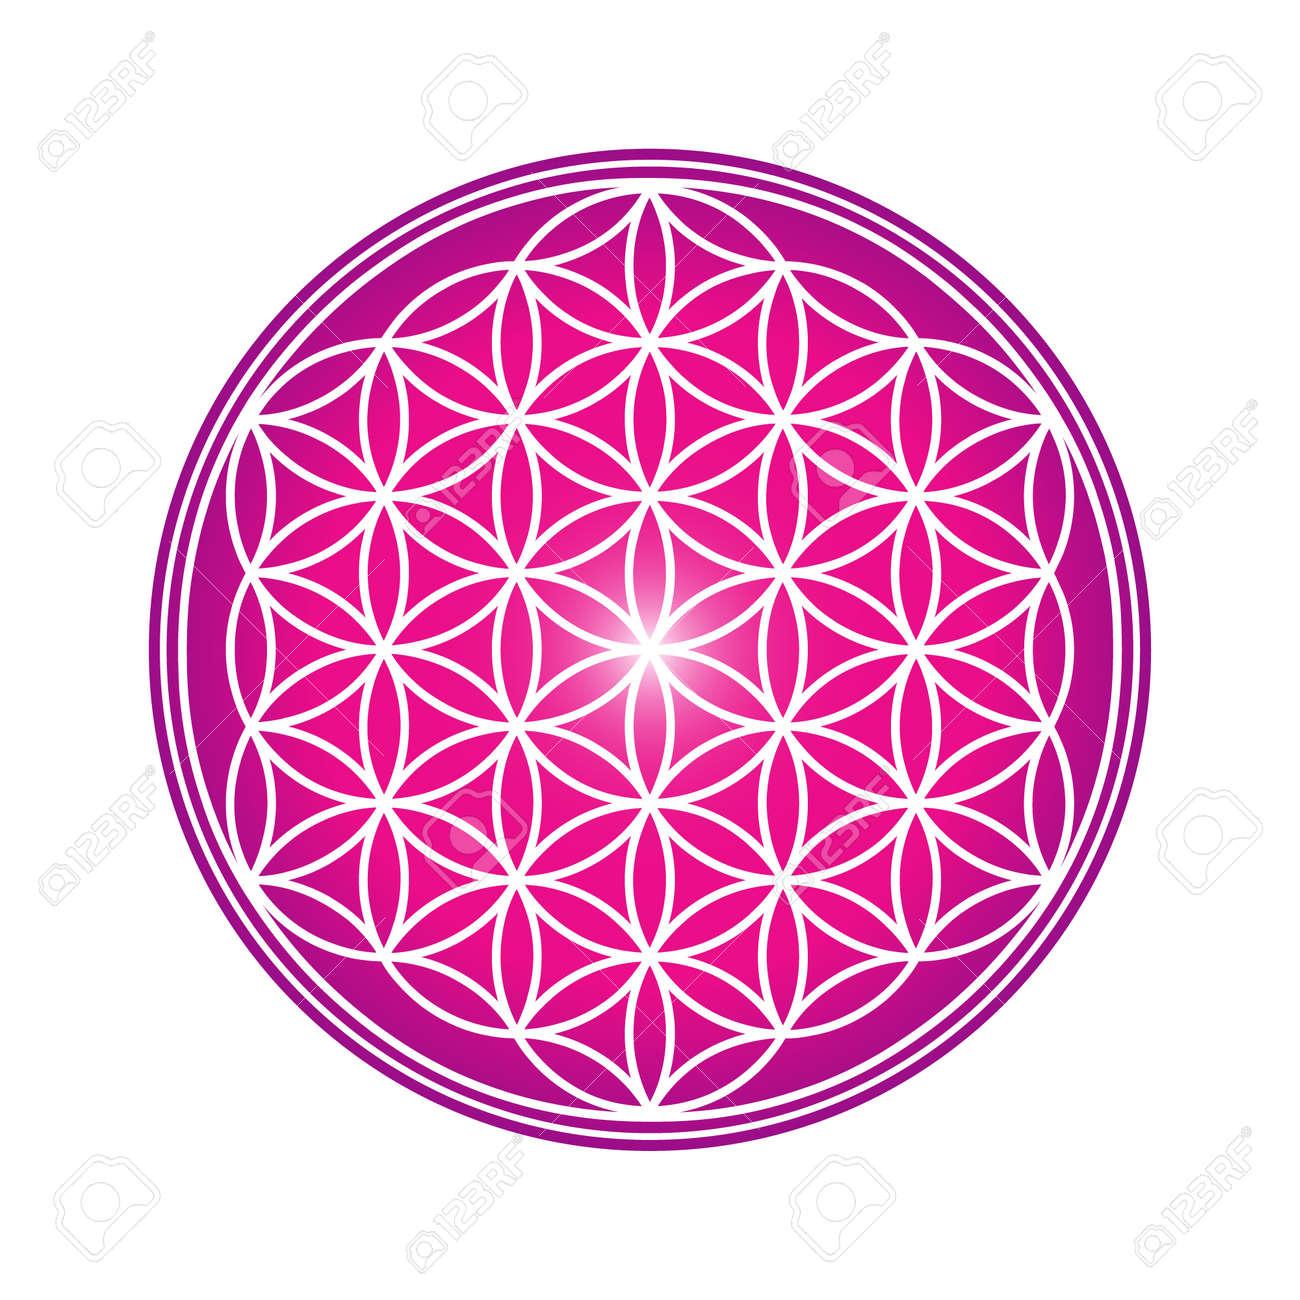 Flower of Life design image, vector illustration. Sacred geometry, symbol of healing and balance. - 155294676